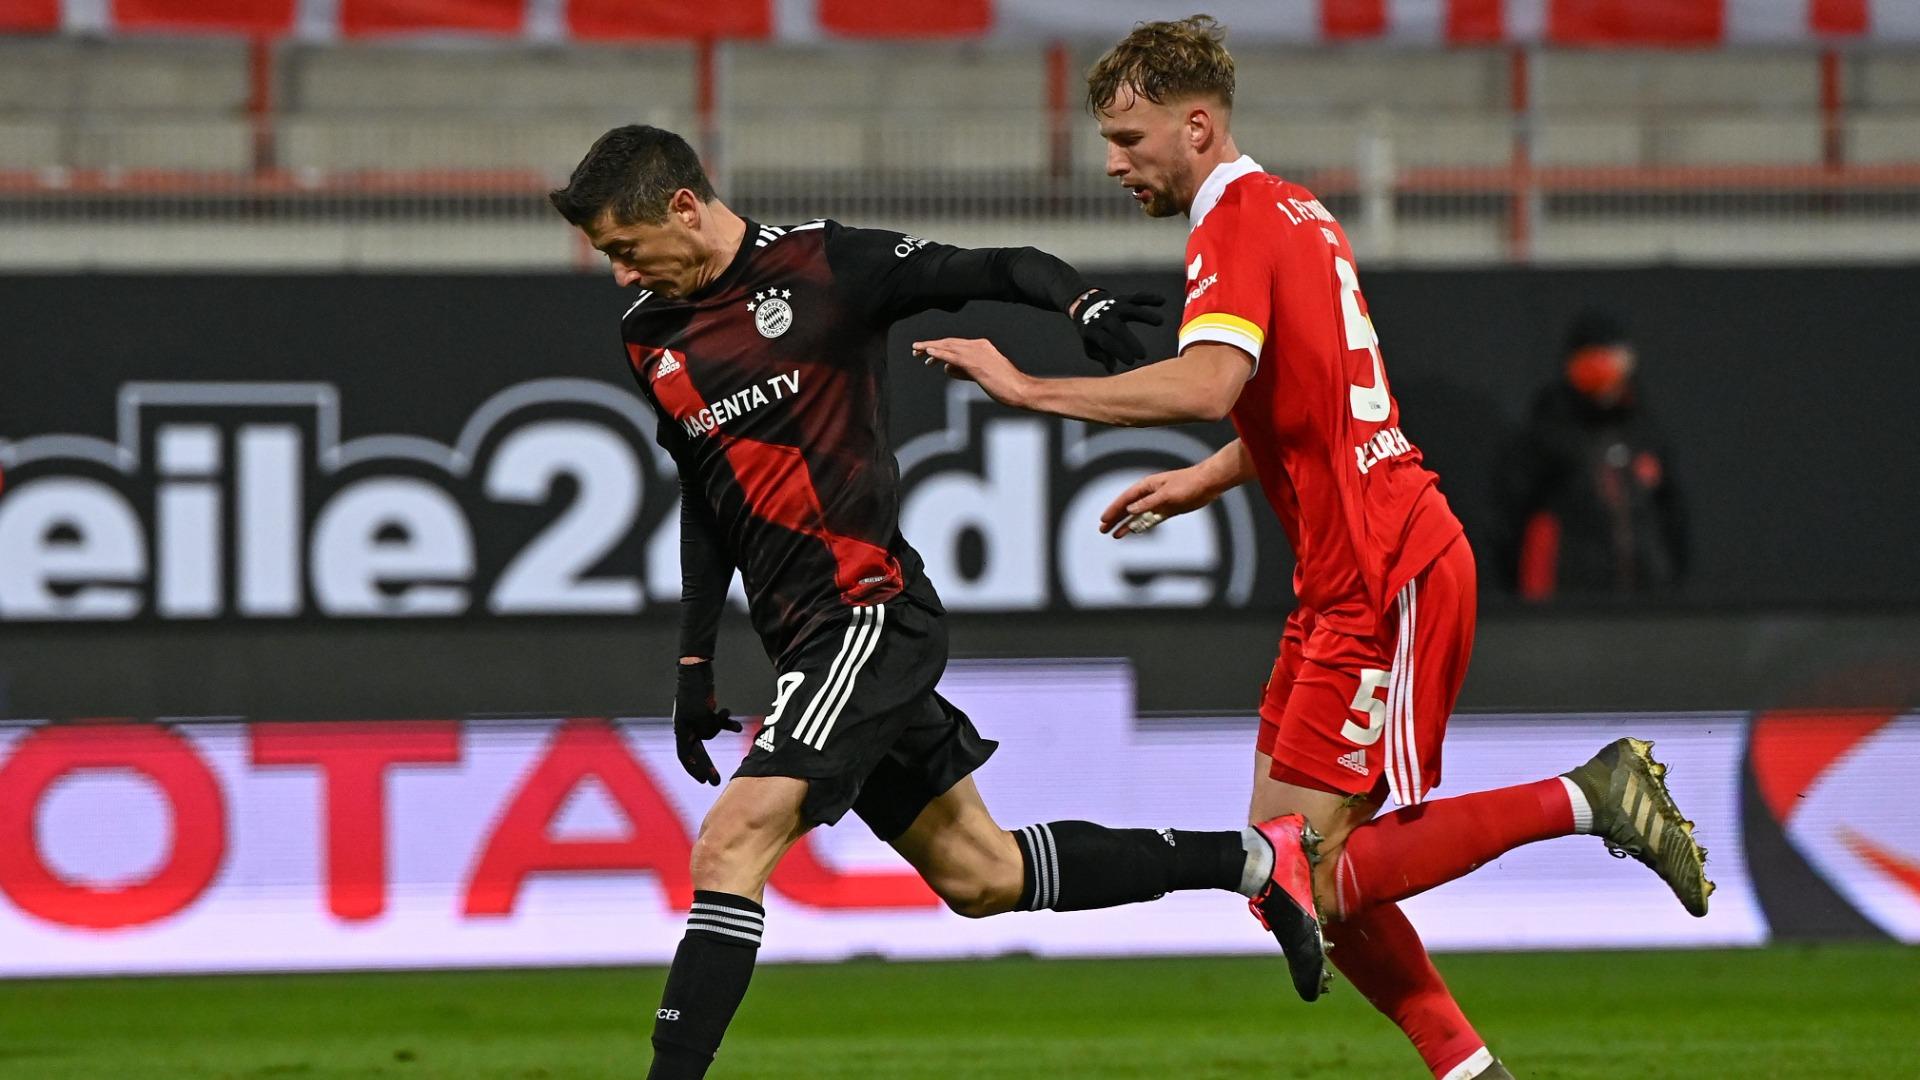 Union Berlin 1-1 Bayern Munich: Lewandowski leveller rescues champions